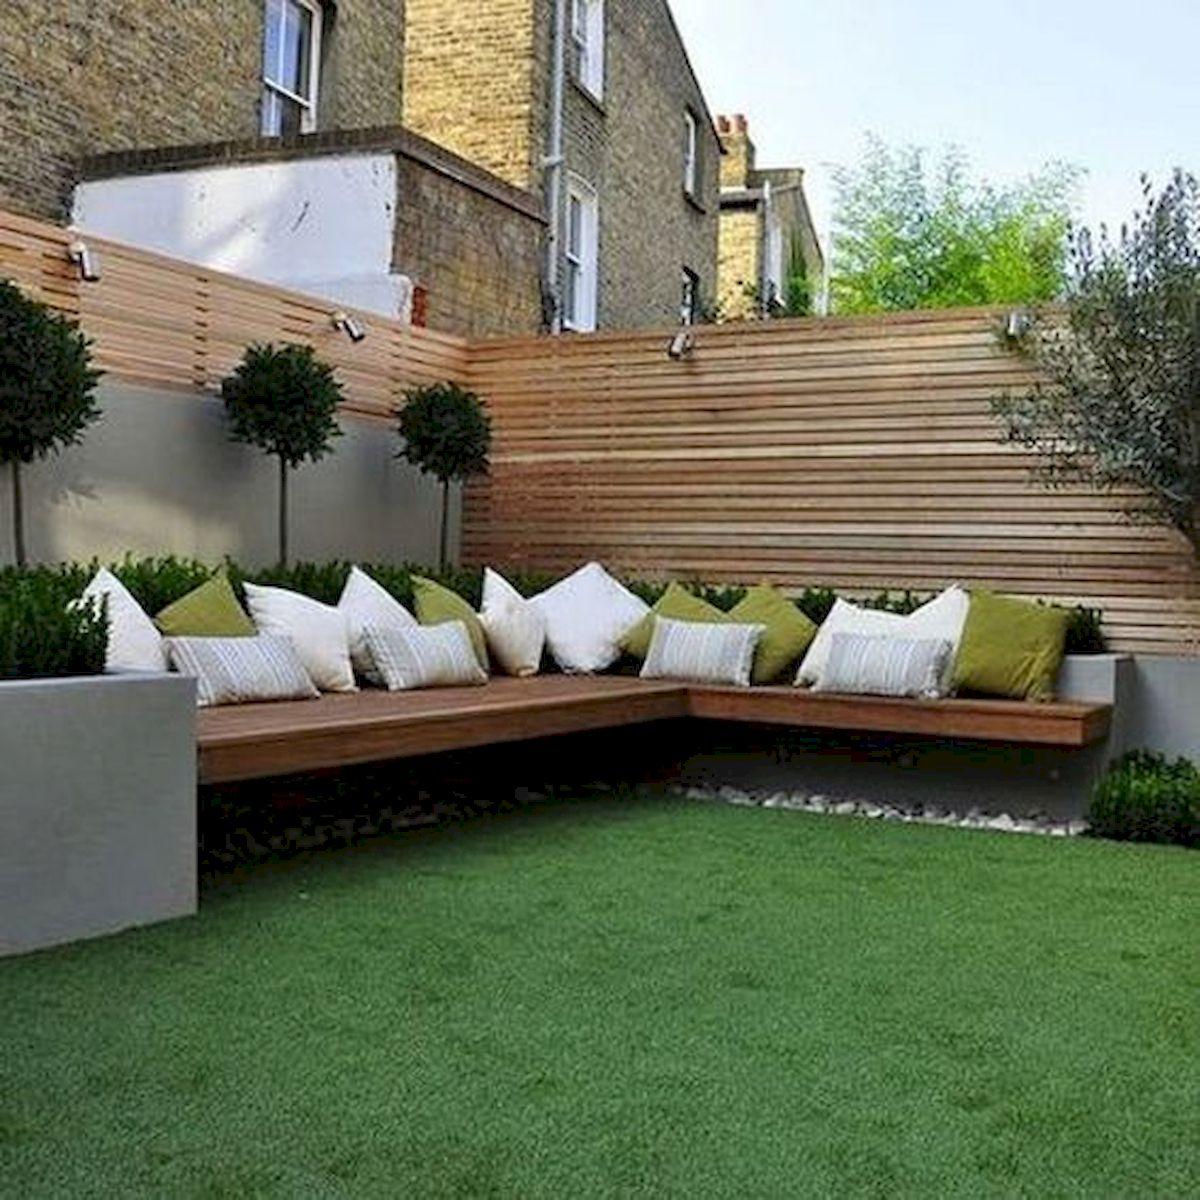 40 Fabulous Modern Garden Designs Ideas For Front Yard and Backyard (25)